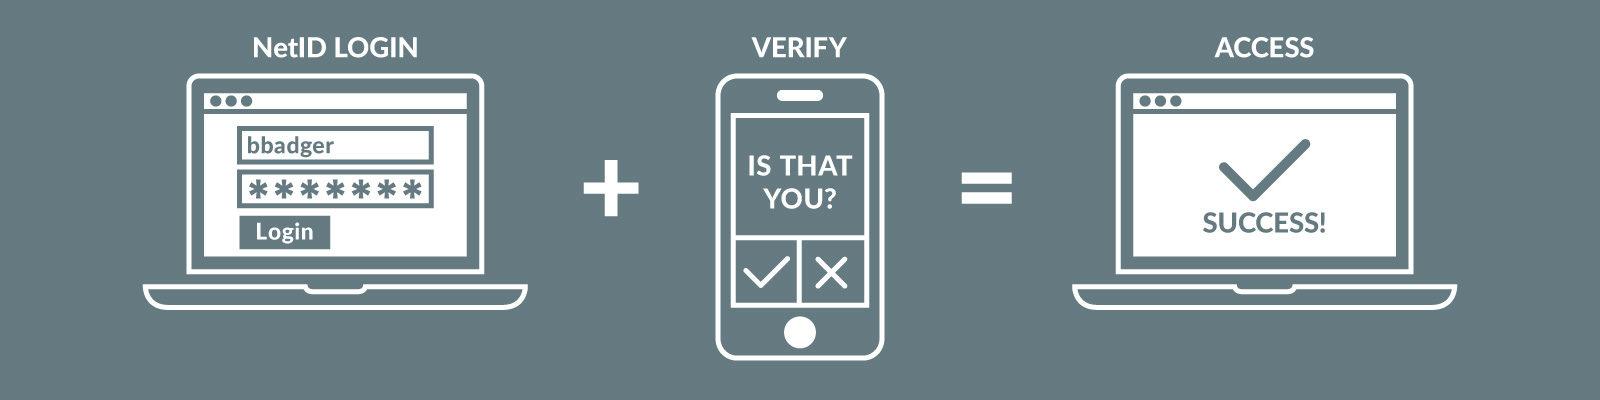 Hero image multi-factor authentication process